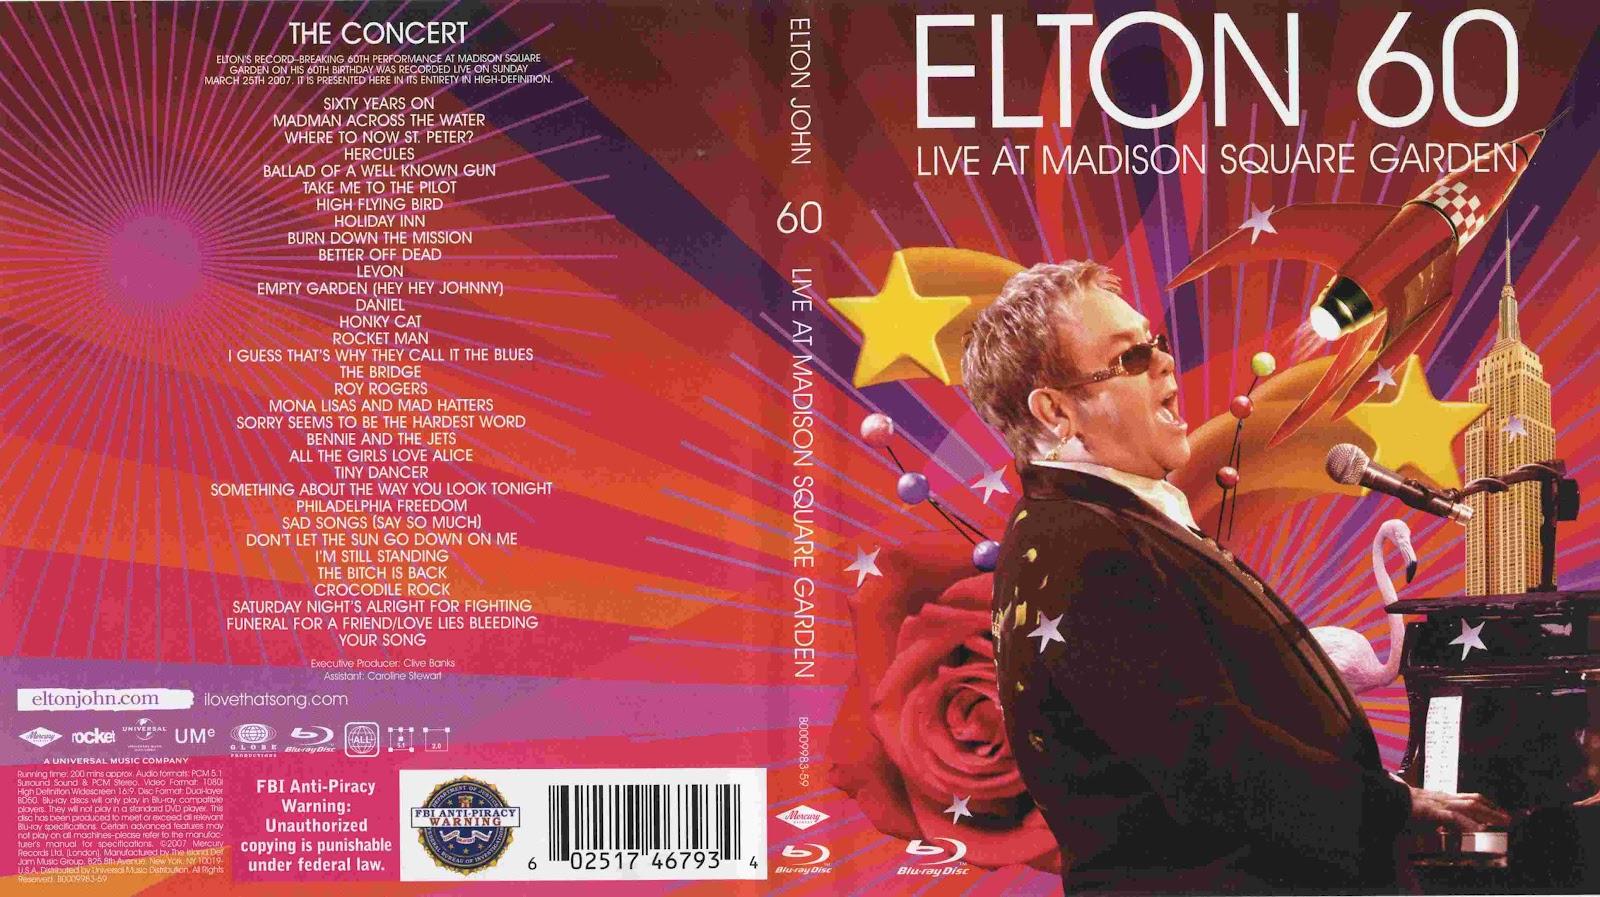 http://4.bp.blogspot.com/-YWjZjANJVgw/UFS3CfBYPdI/AAAAAAAAAv8/PL-e-WKLAA8/s1600/Elton_John_60_-_Live_At_Madison_Square_Garden-%255Bfront%255D-%255Bwww.FreeCovers.net%255D.jpg